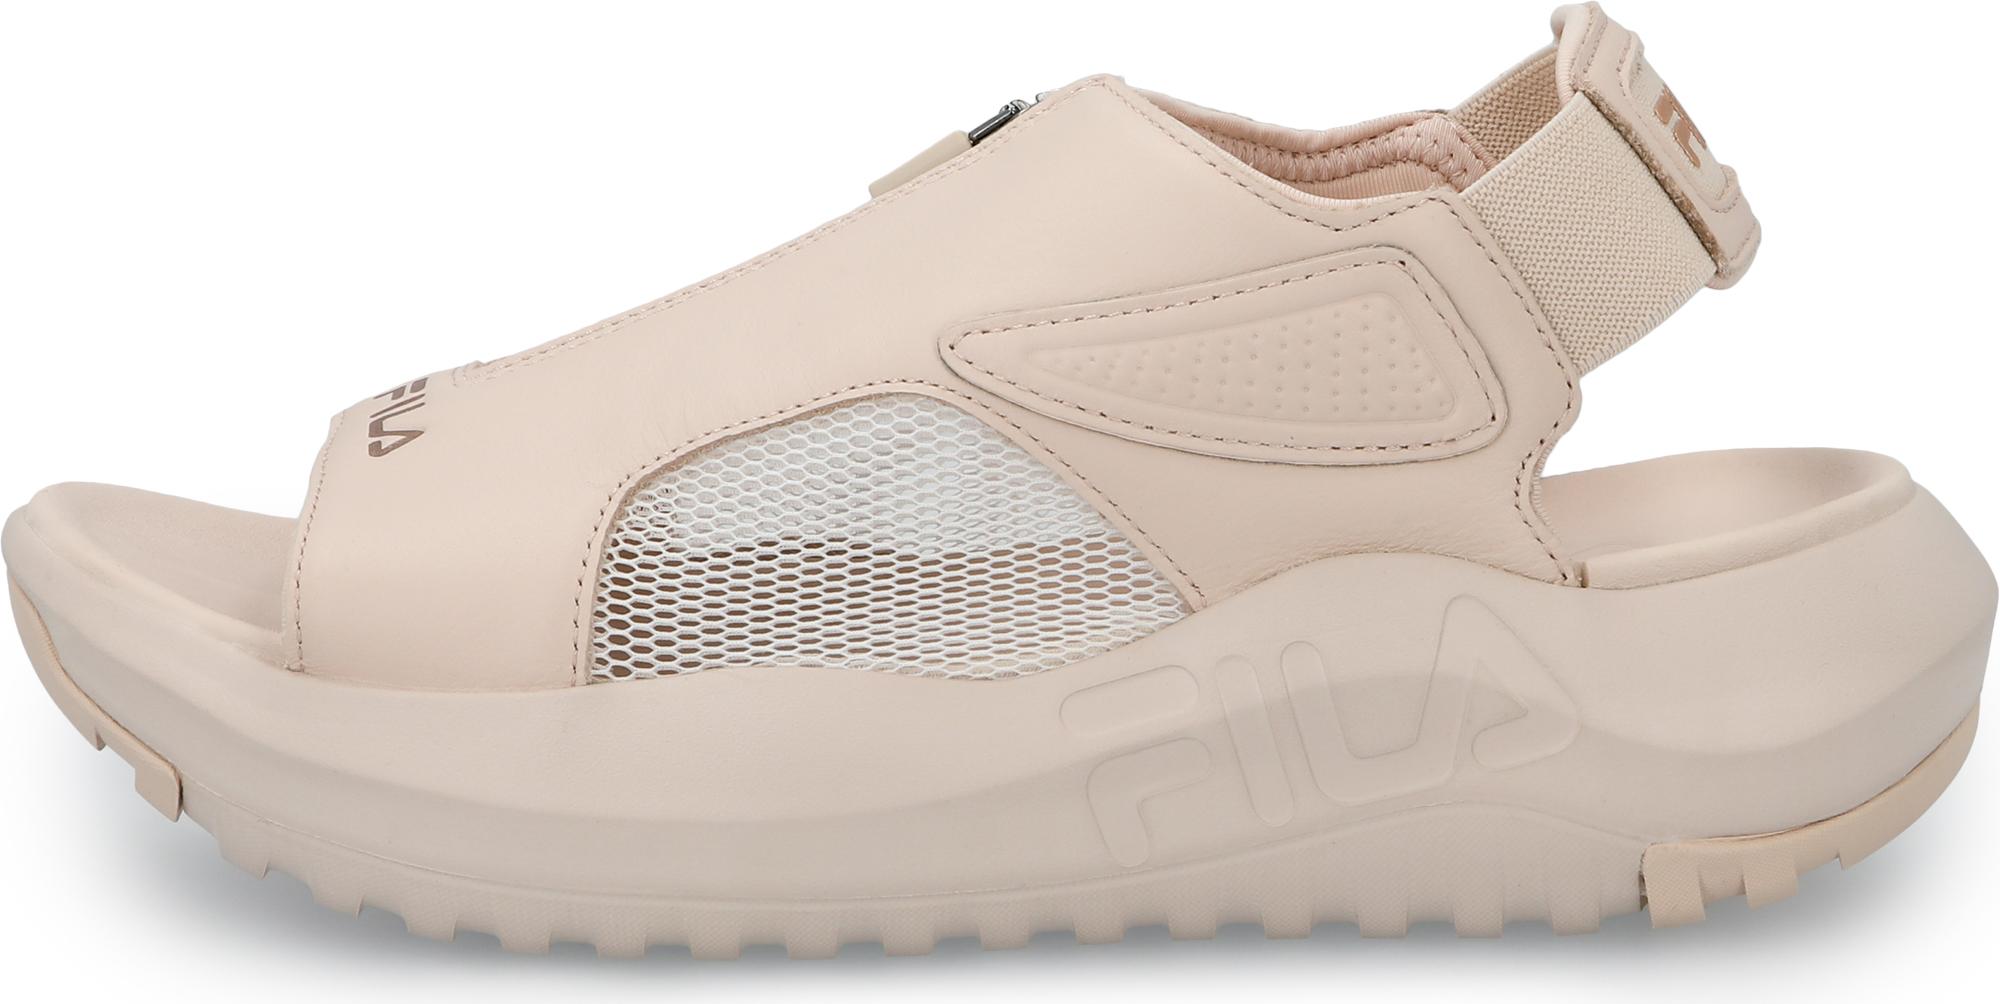 Fila Сандалии женские Fila Versus Sandals Cl, размер 35